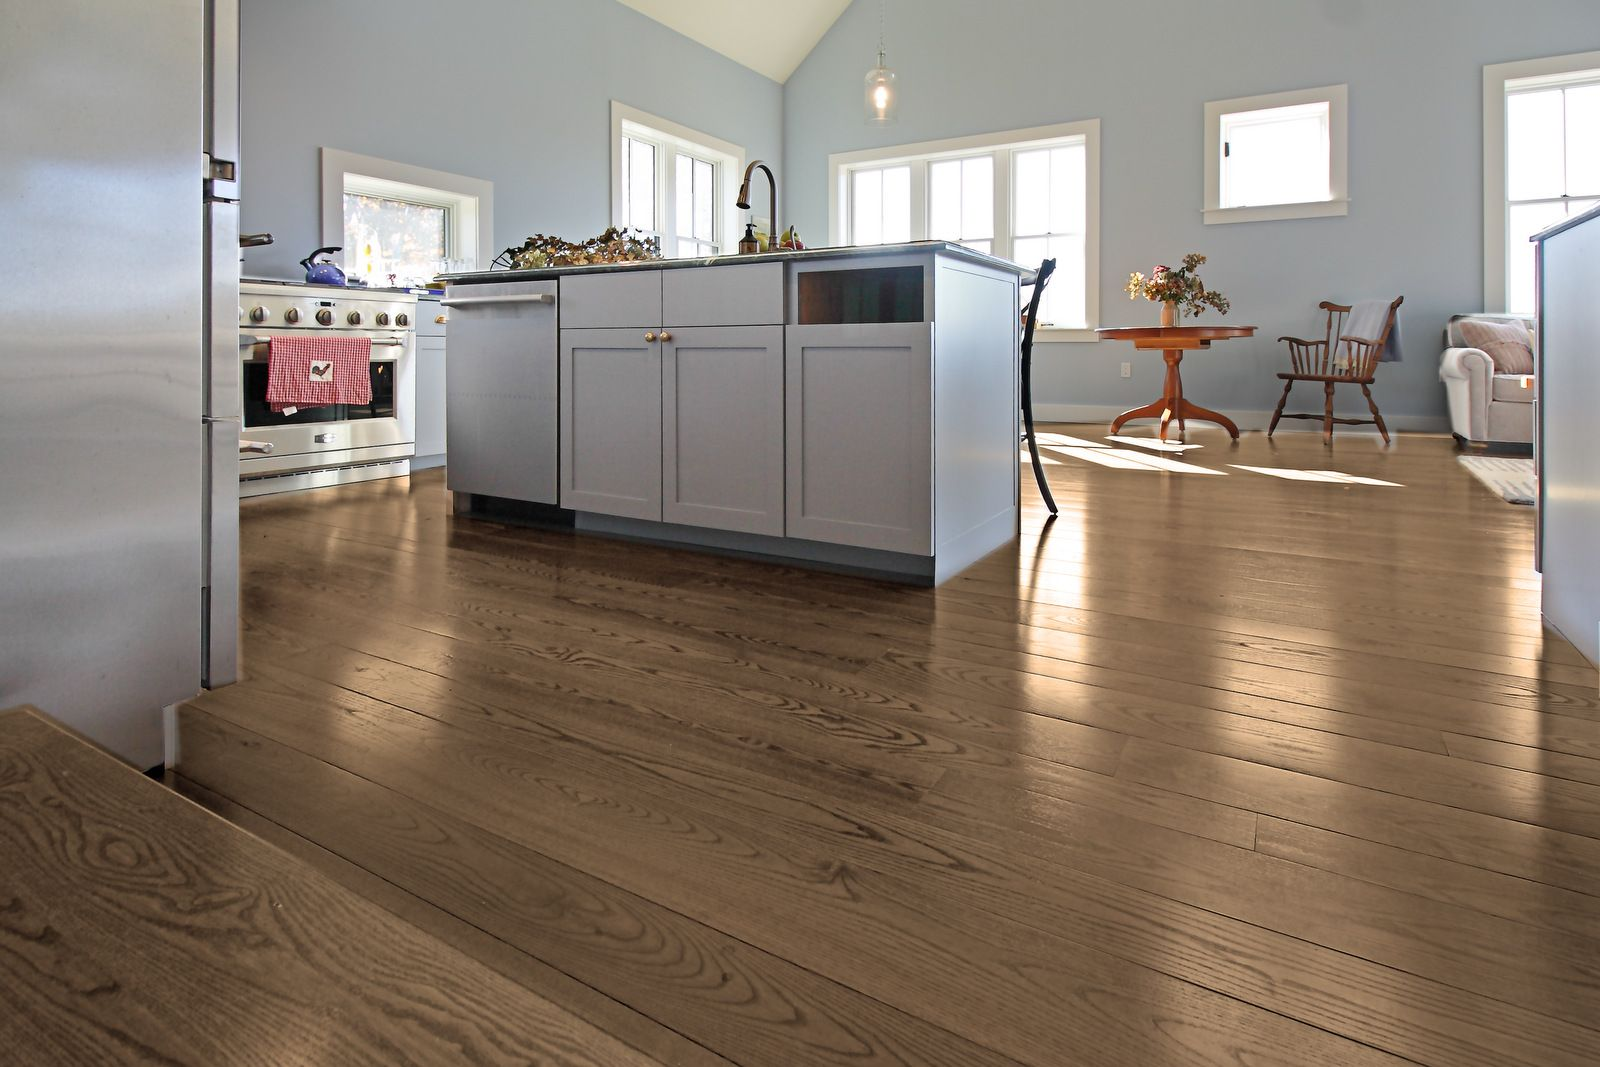 Ash plank flooring makes a durable kitchen floor